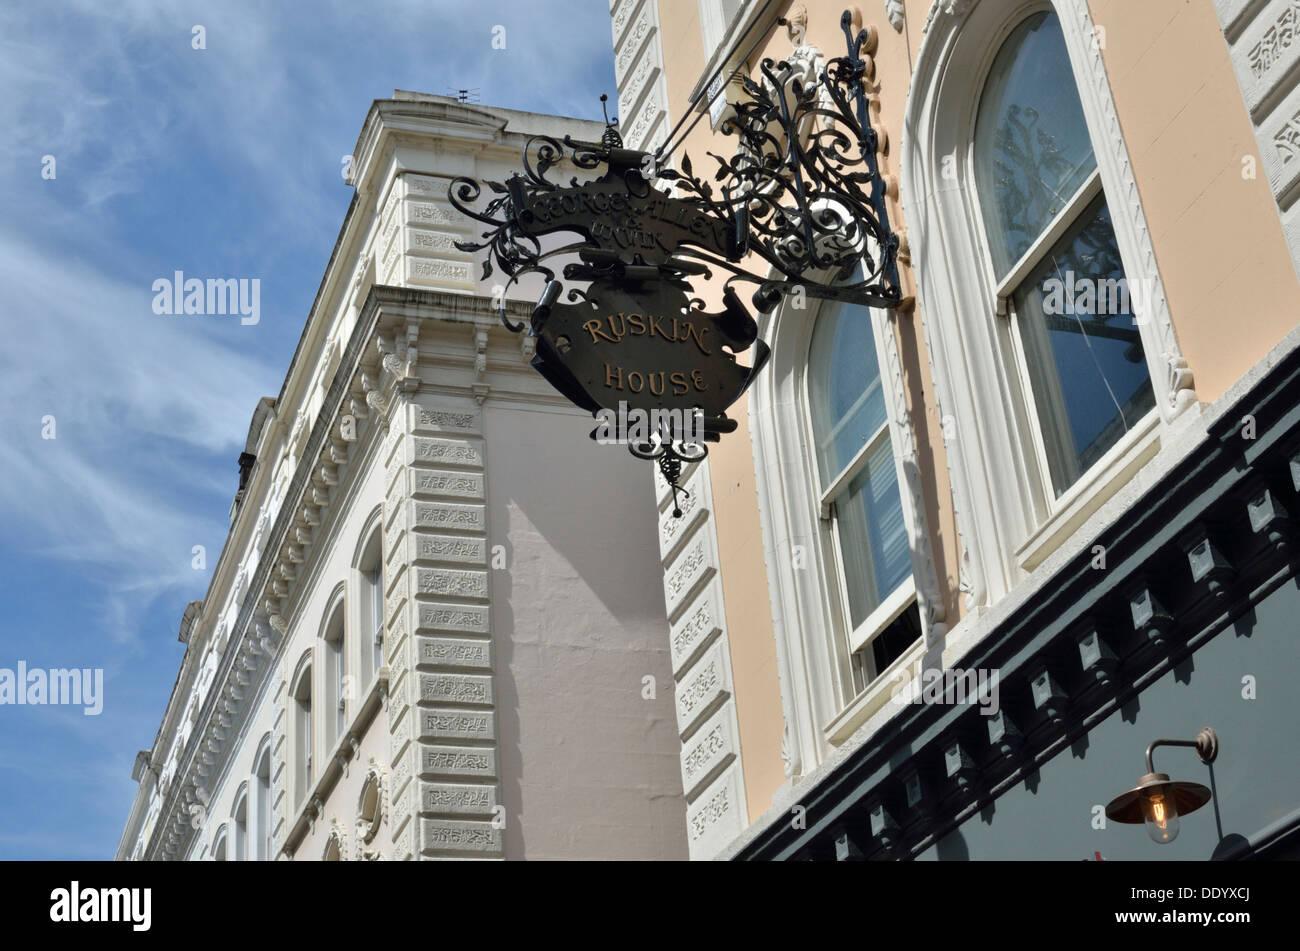 Ruskin House in Museum Street, Bloomsbury, London, UK. - Stock Image